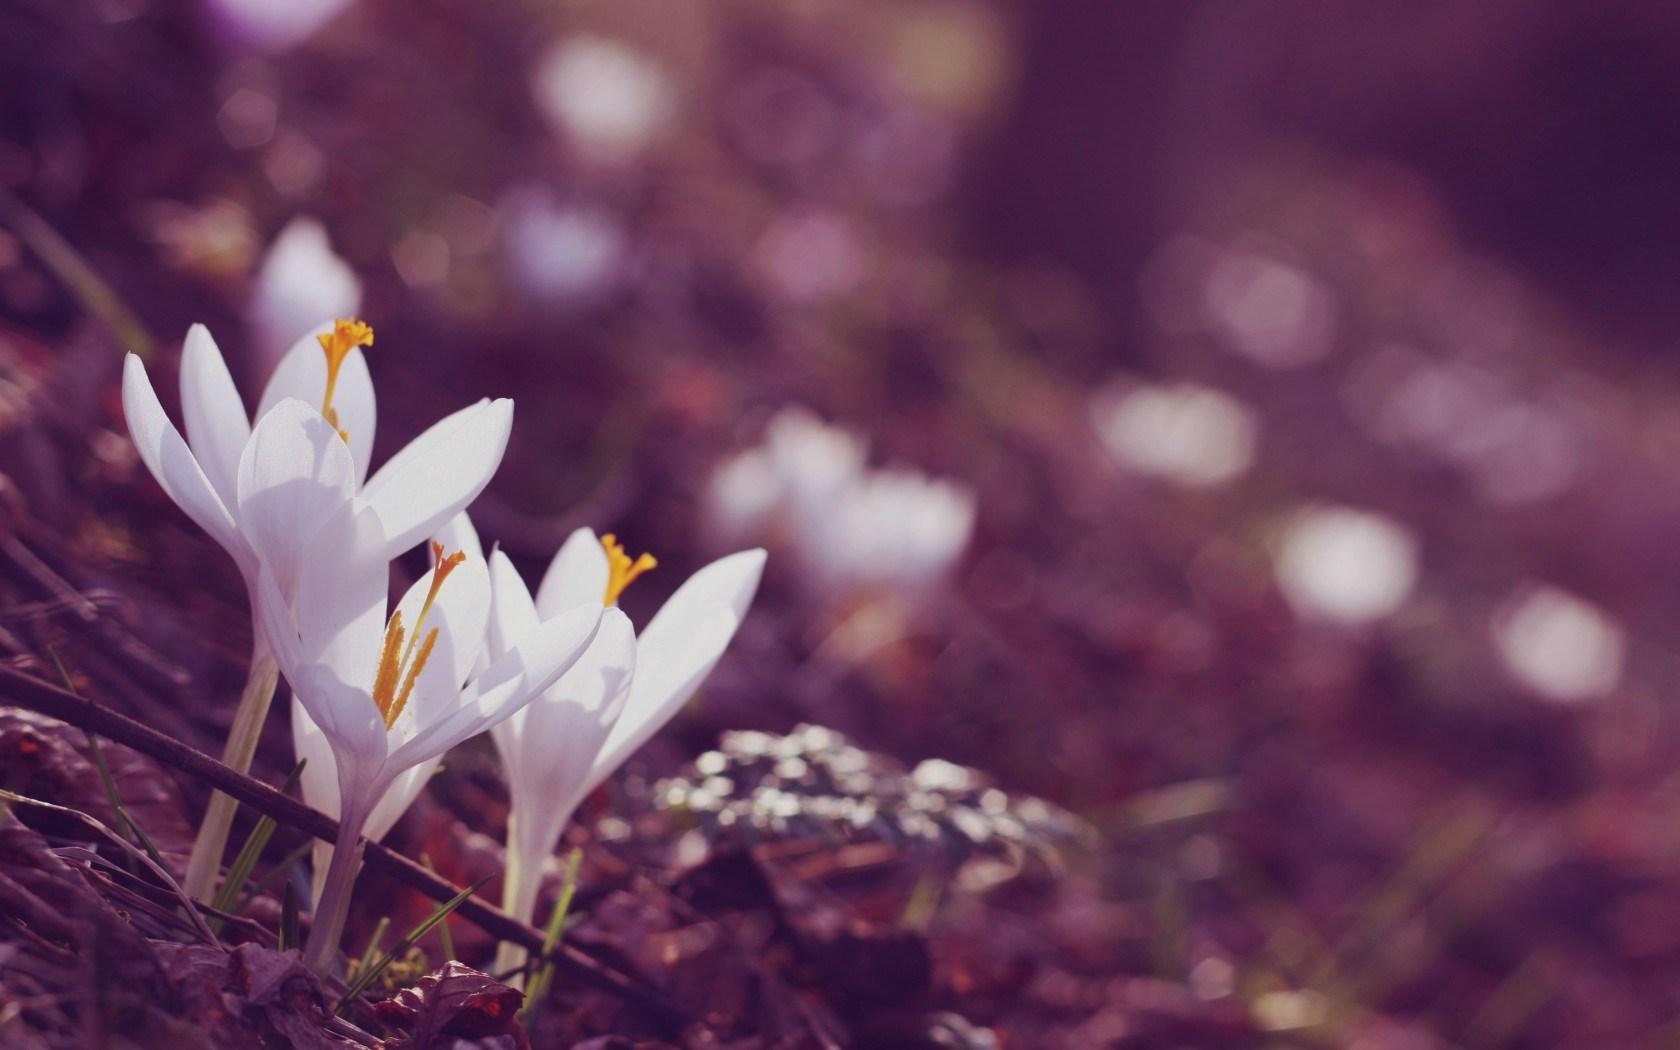 crocuses flowers white A2